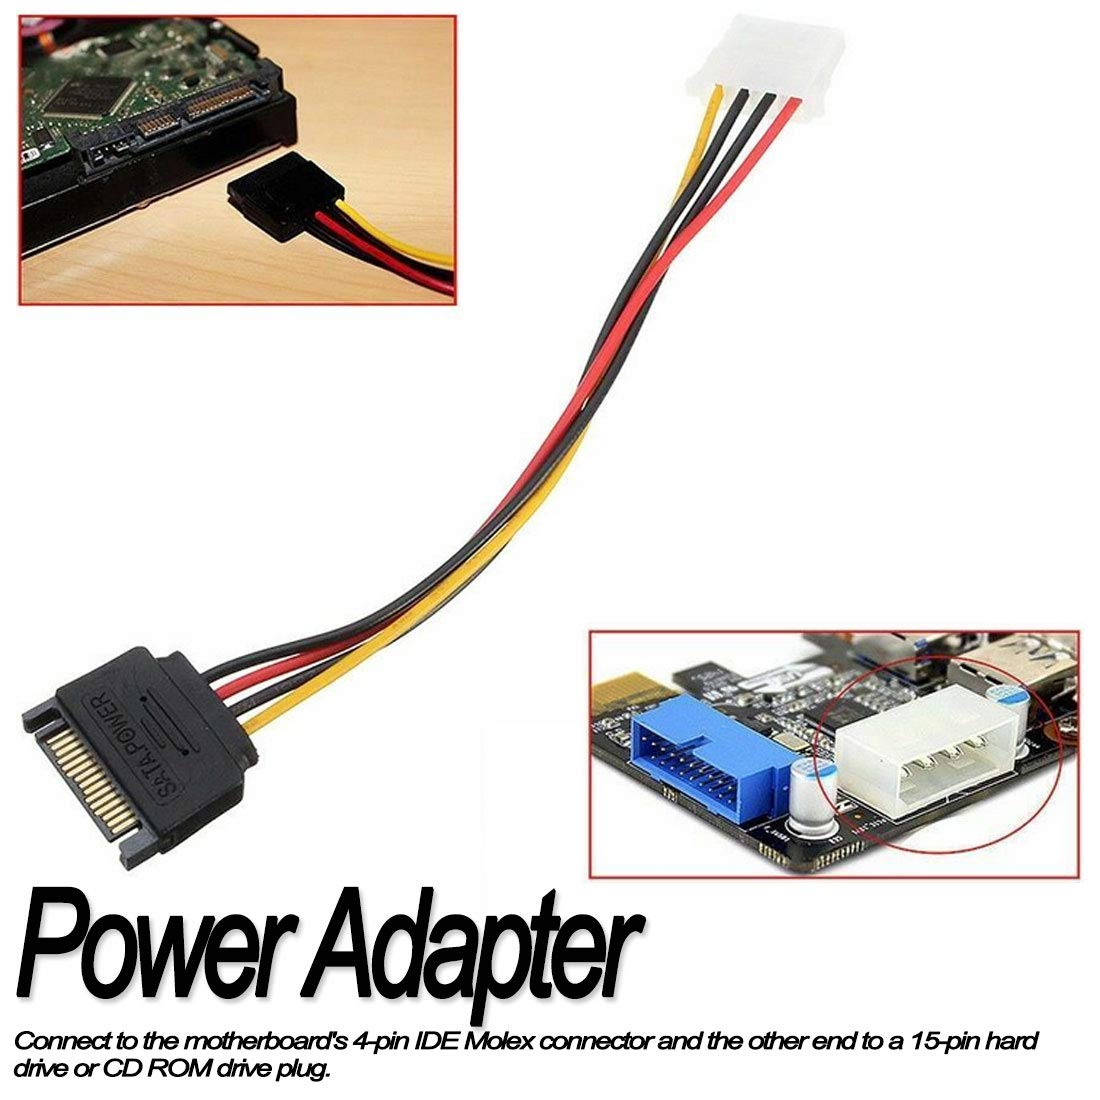 Desconocido 4 Pin Molex IDE to 15 Pin Serial Power Adapter Cable Converter